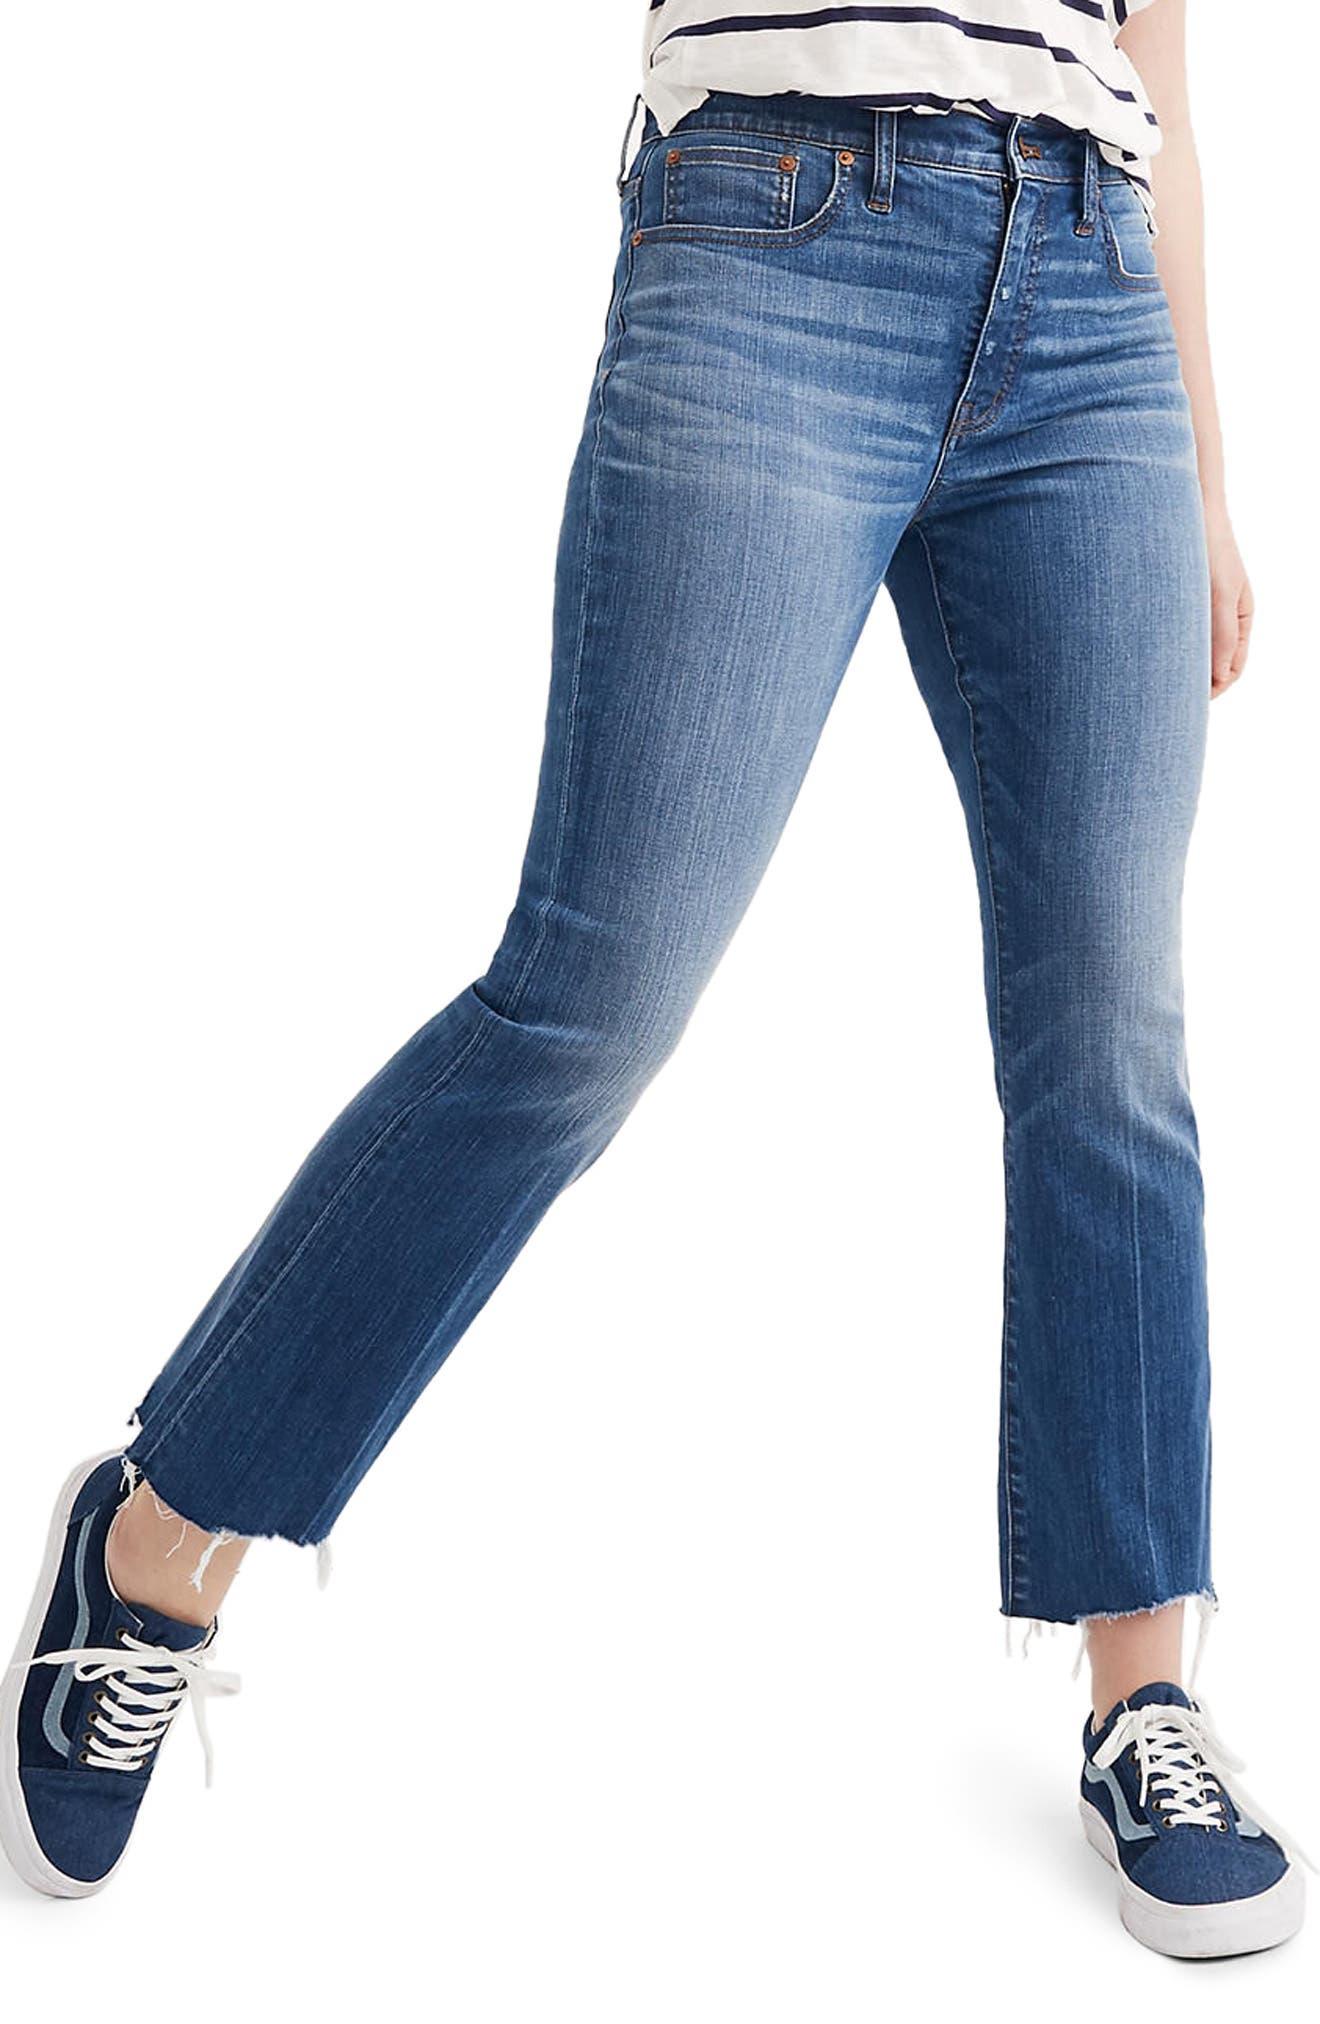 Cali Demi Boot Jeans,                             Main thumbnail 1, color,                             400